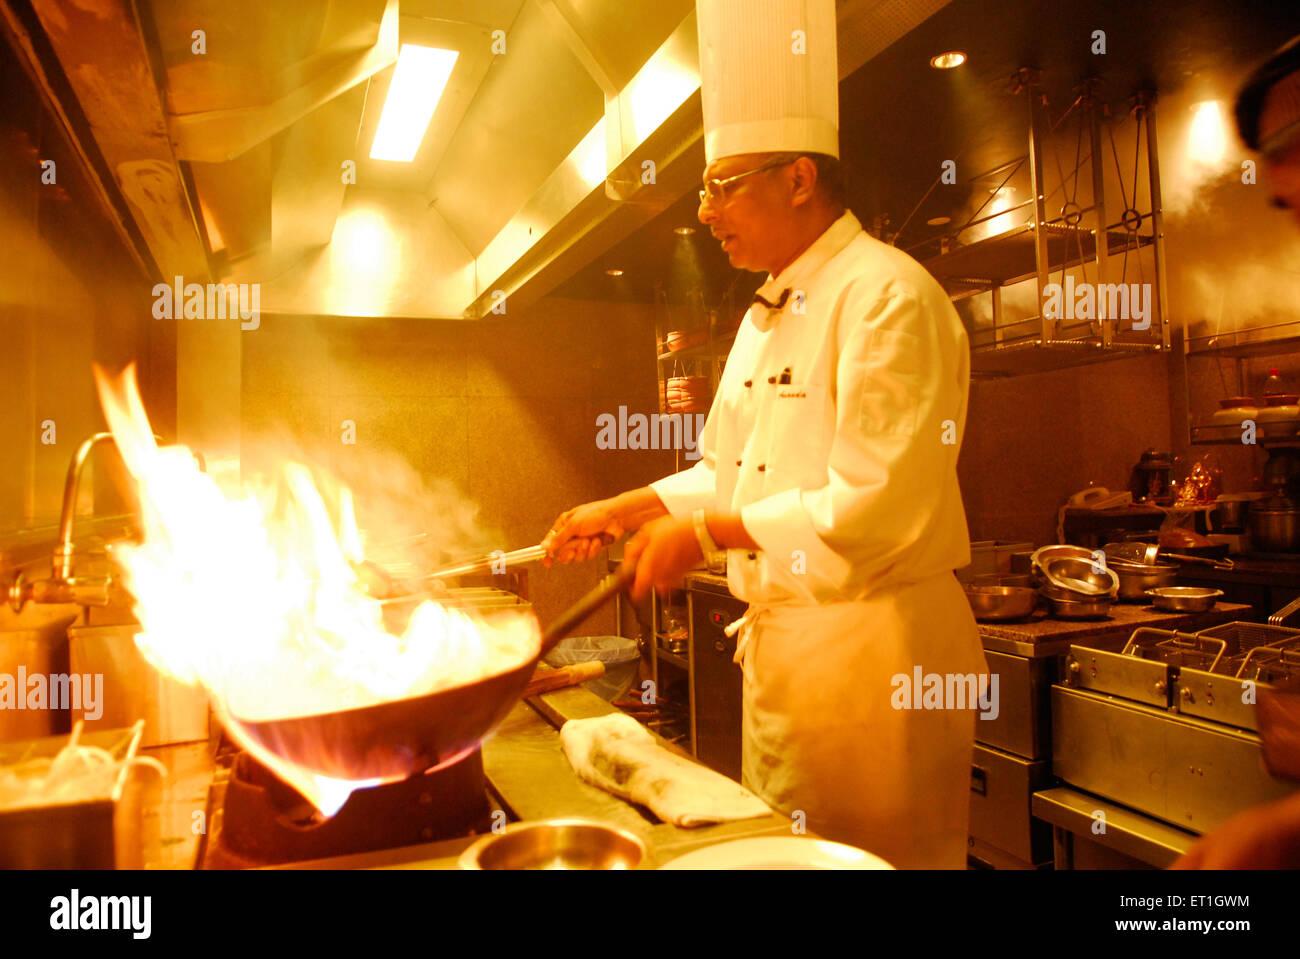 Chef ananda solamac ; India NO MR - Stock Image